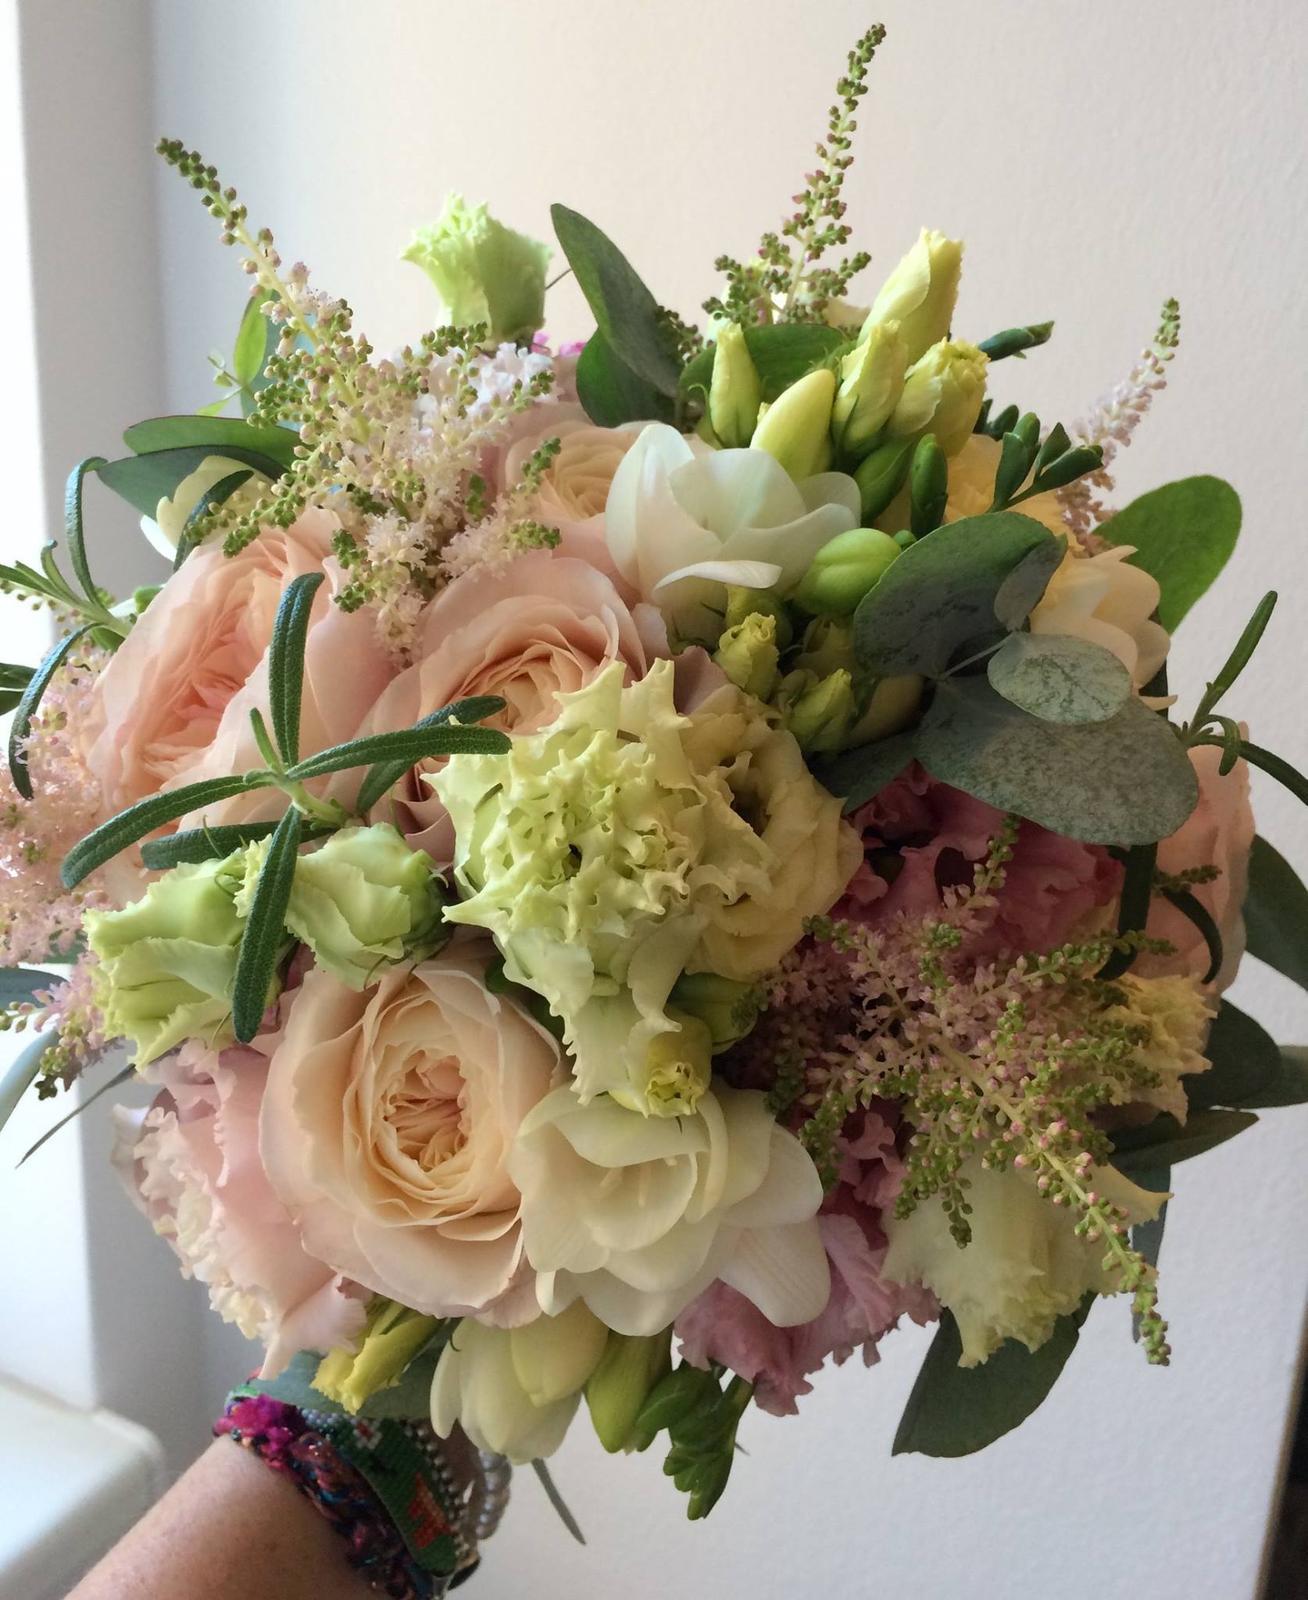 Růžovo-bílá svatební kytice - Obrázek č. 1